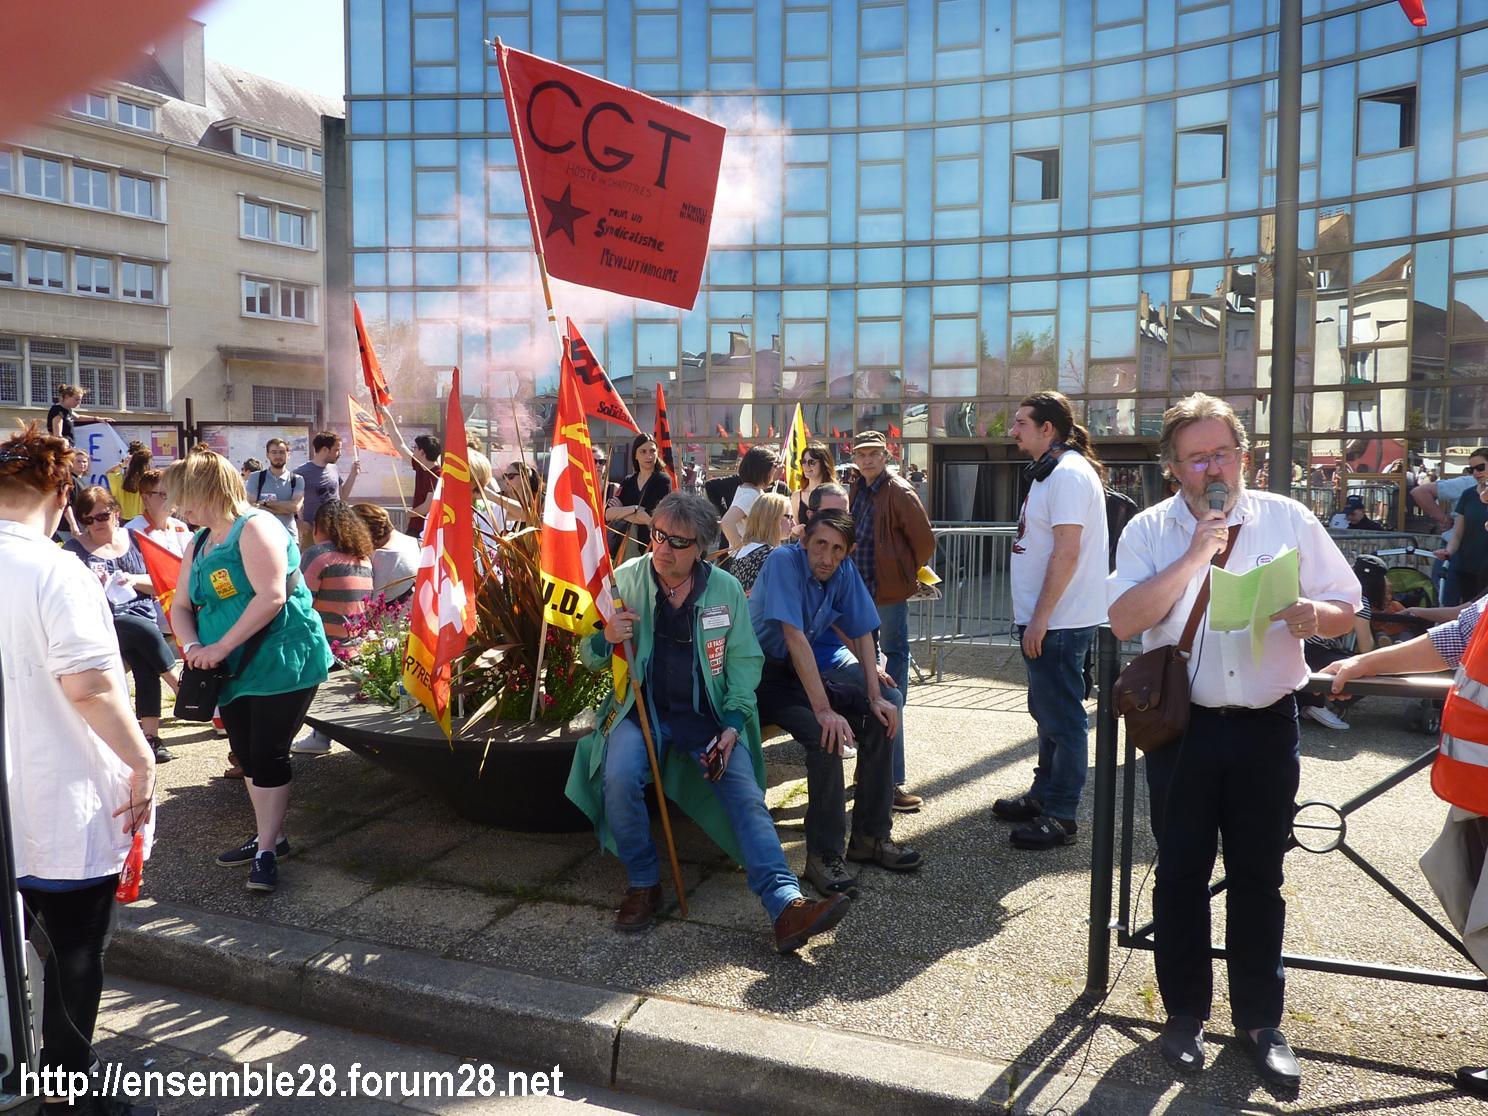 19-04-2018 Chartres Manifestation Interprofessionnelle CGT Solidaires SNES-FSU n°17